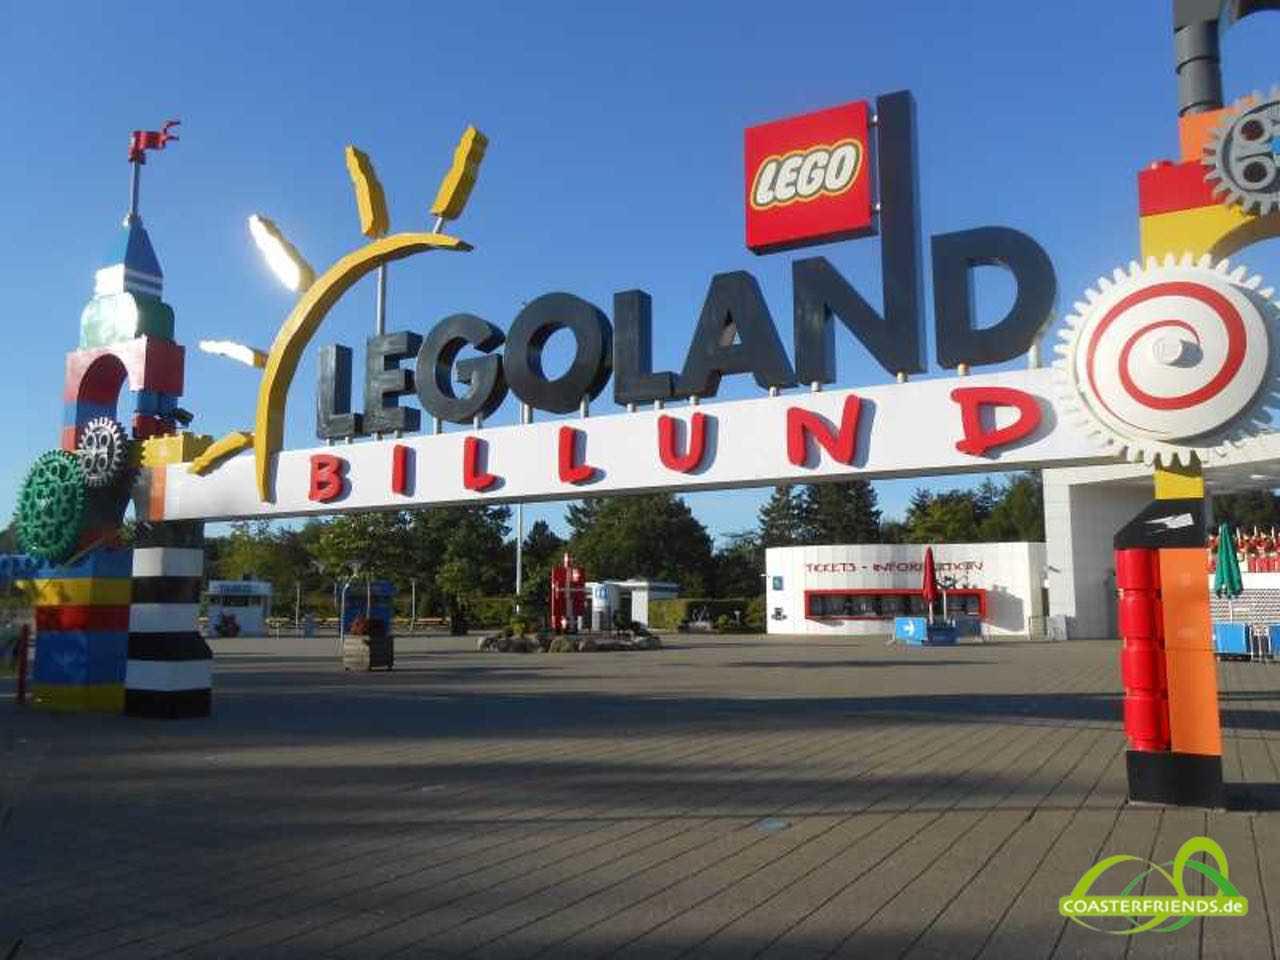 Europa - https://coasterfriends.de/joomla//images/pcp_parkdetails/europa/o1597_Legoland_Billund/content1.jpg